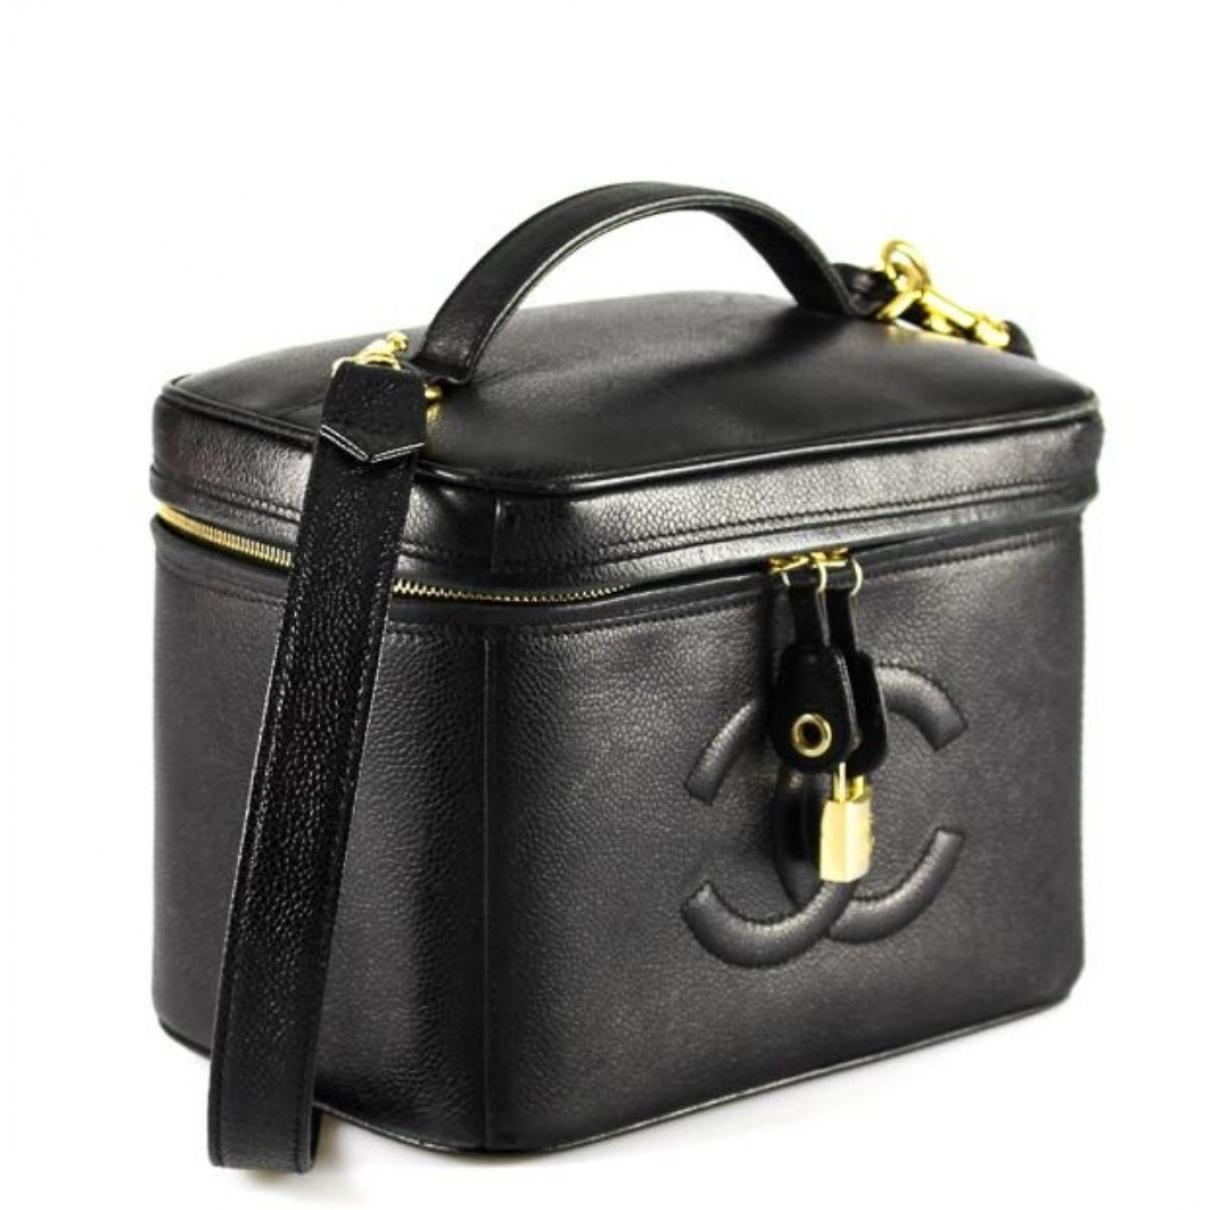 dc985824acdd Chanel. Women s Black Leather Vanity Case. £1